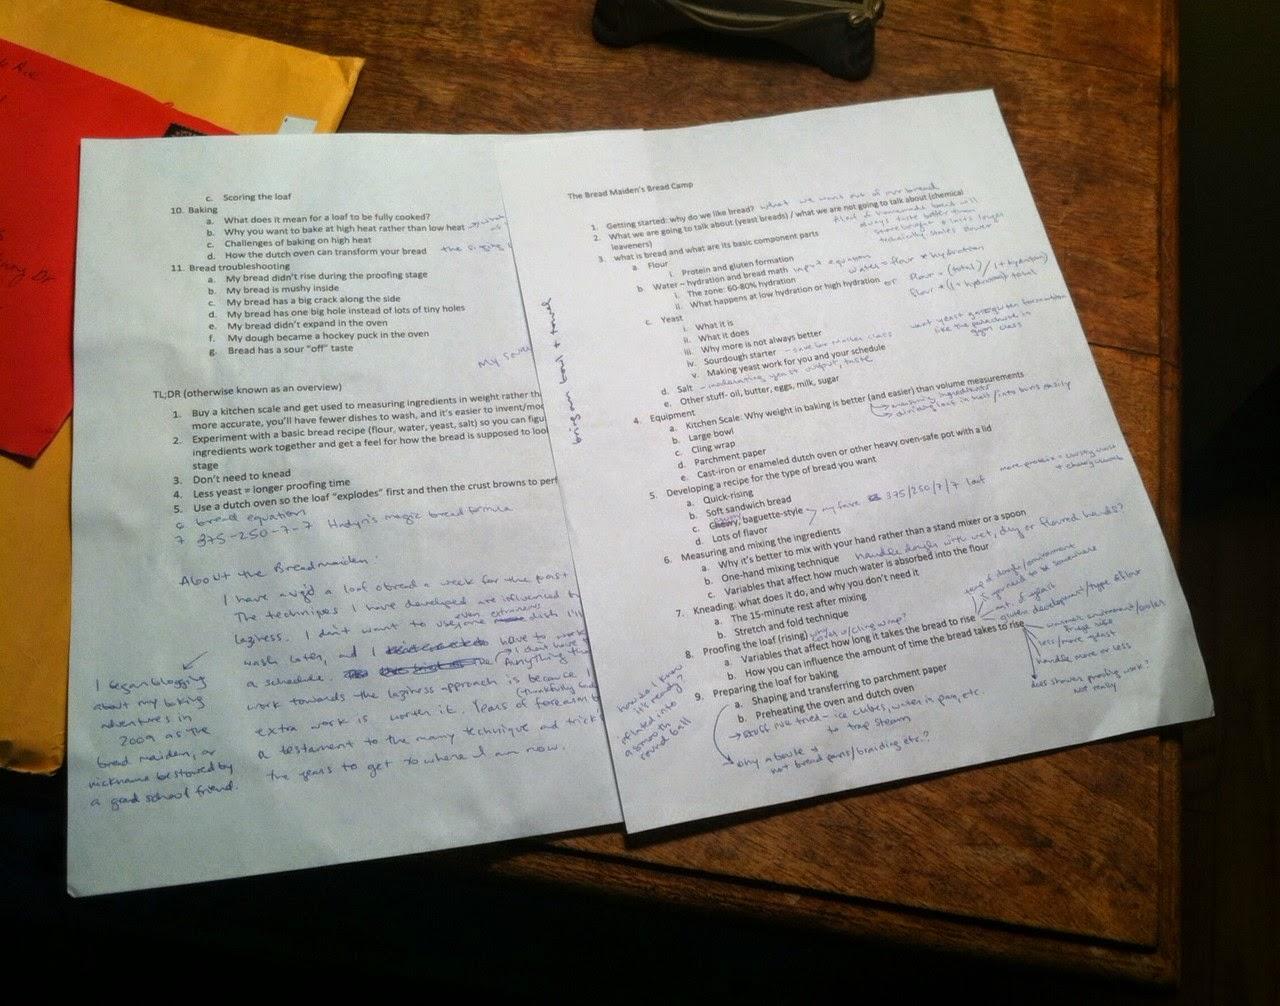 type my papers Wecyvibinxpgcombr.